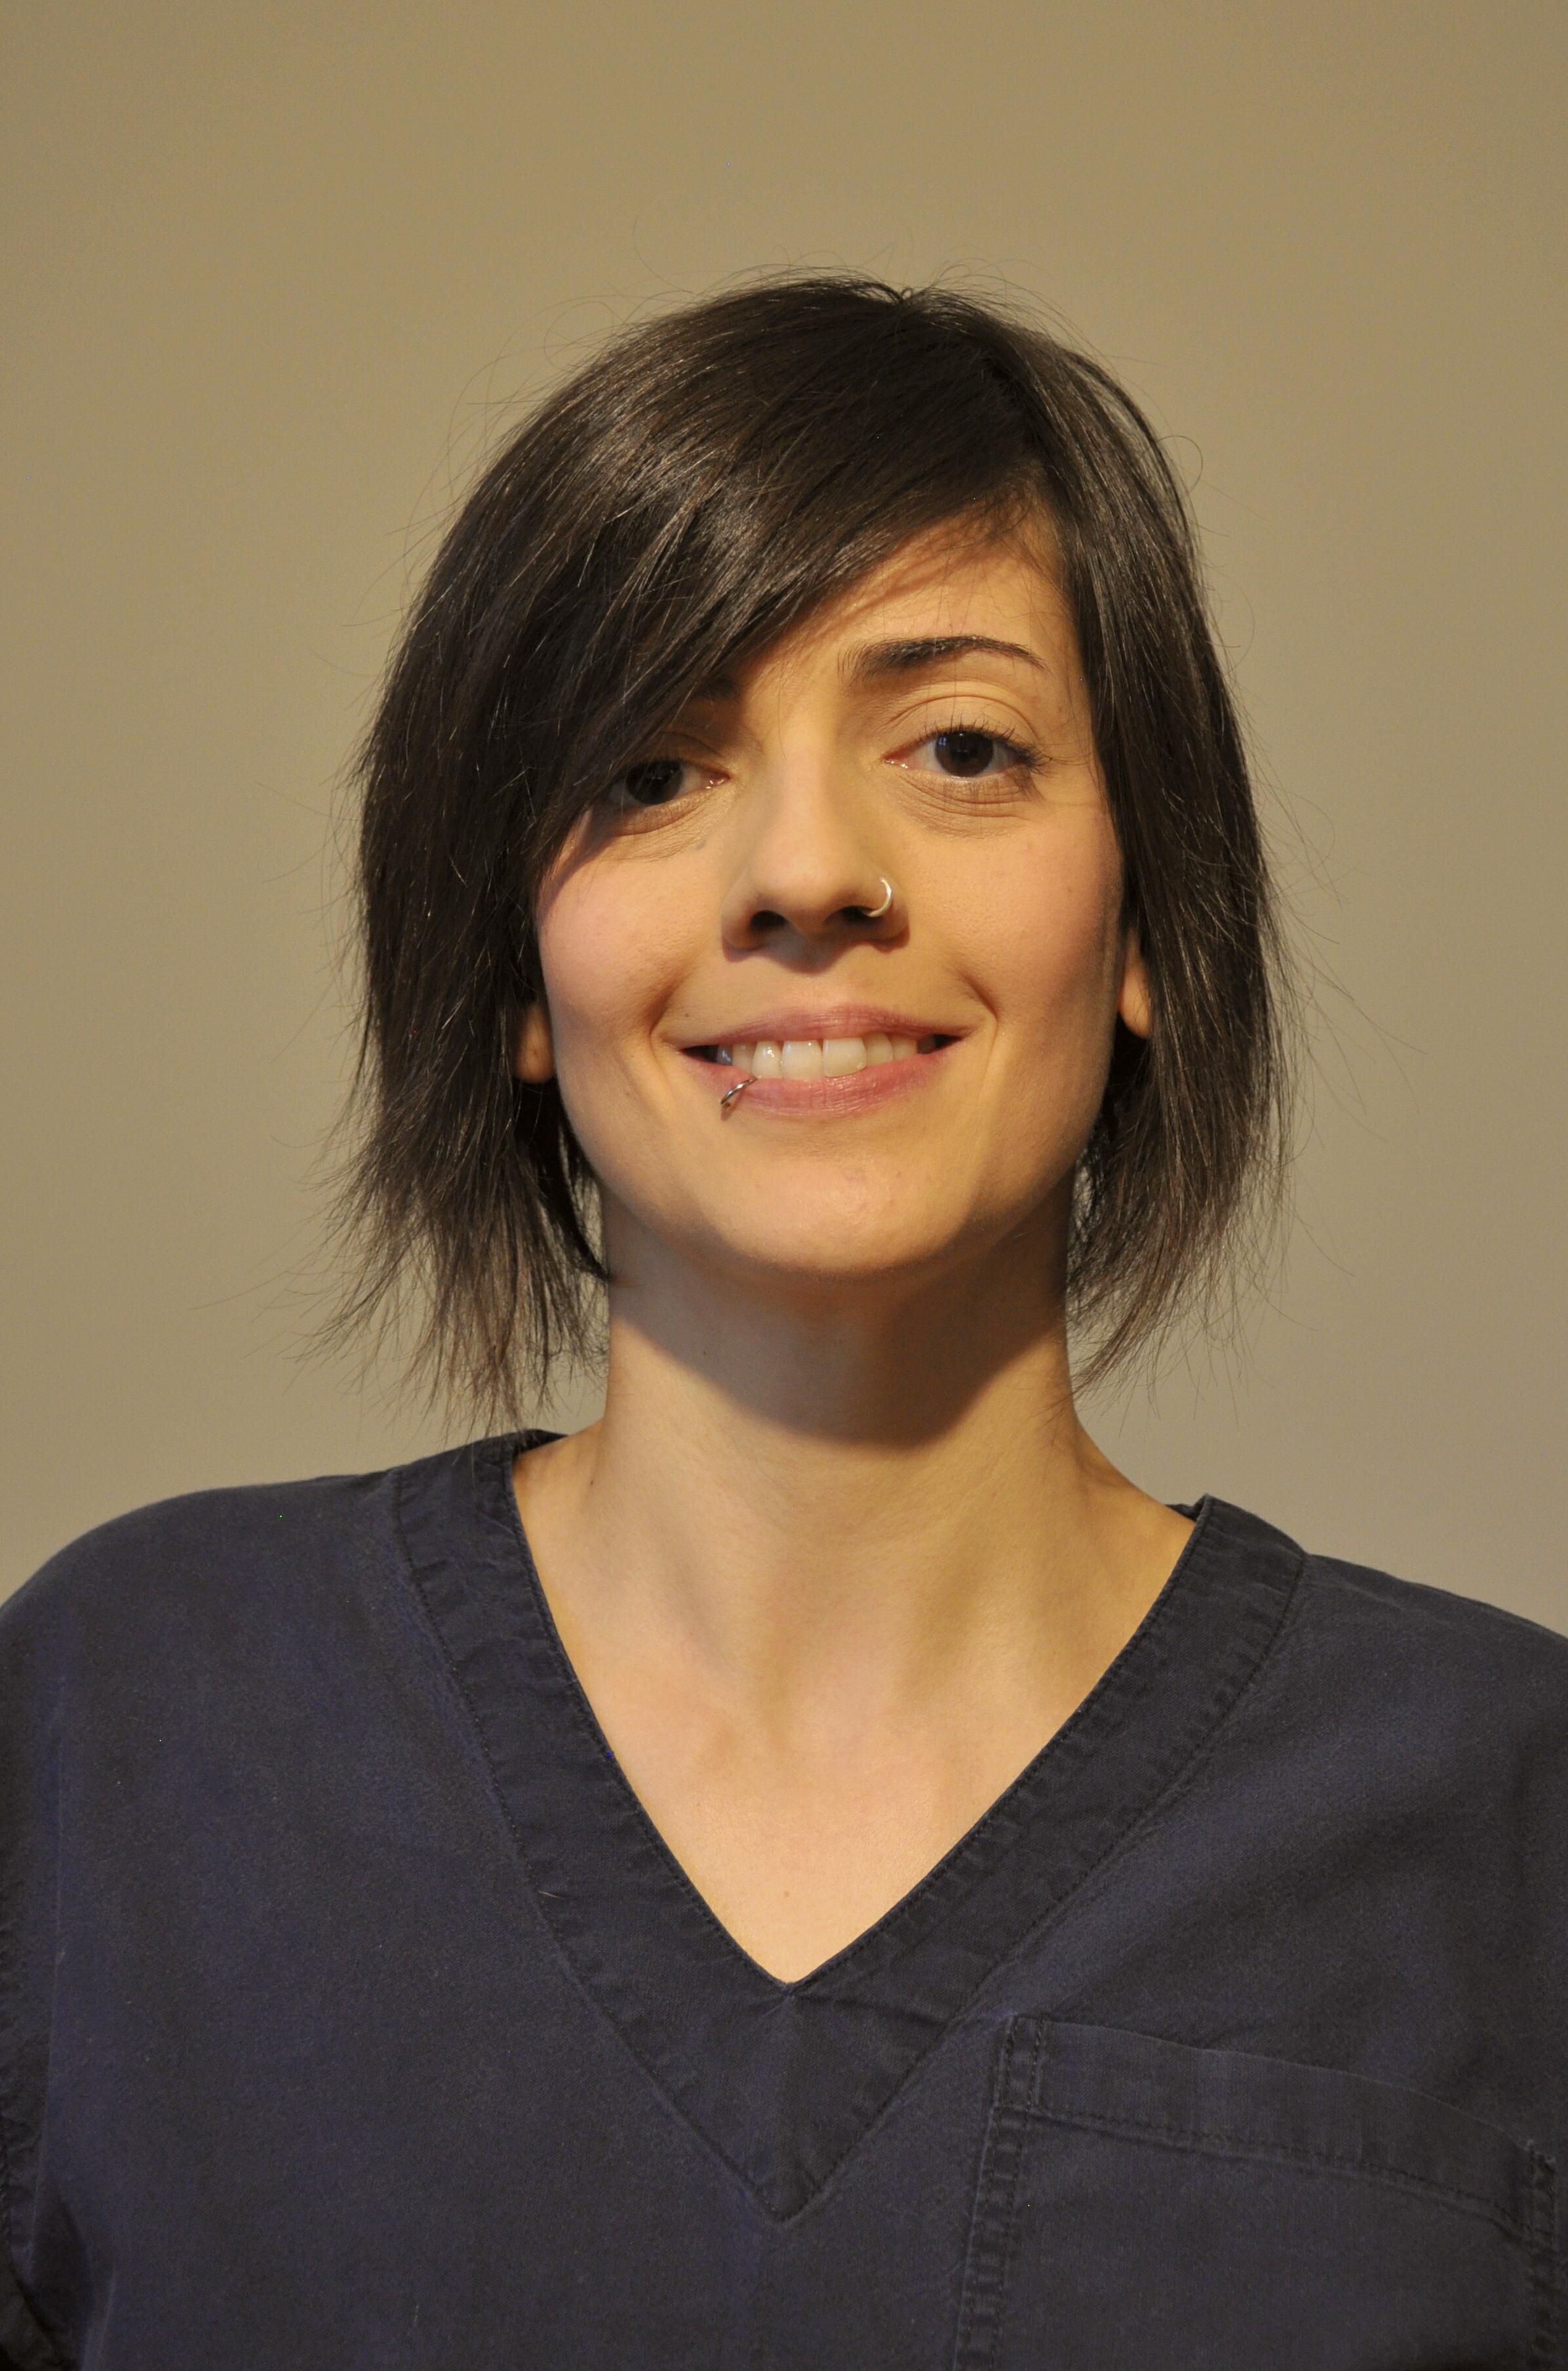 Dott. ssa Rita Bucchignoli